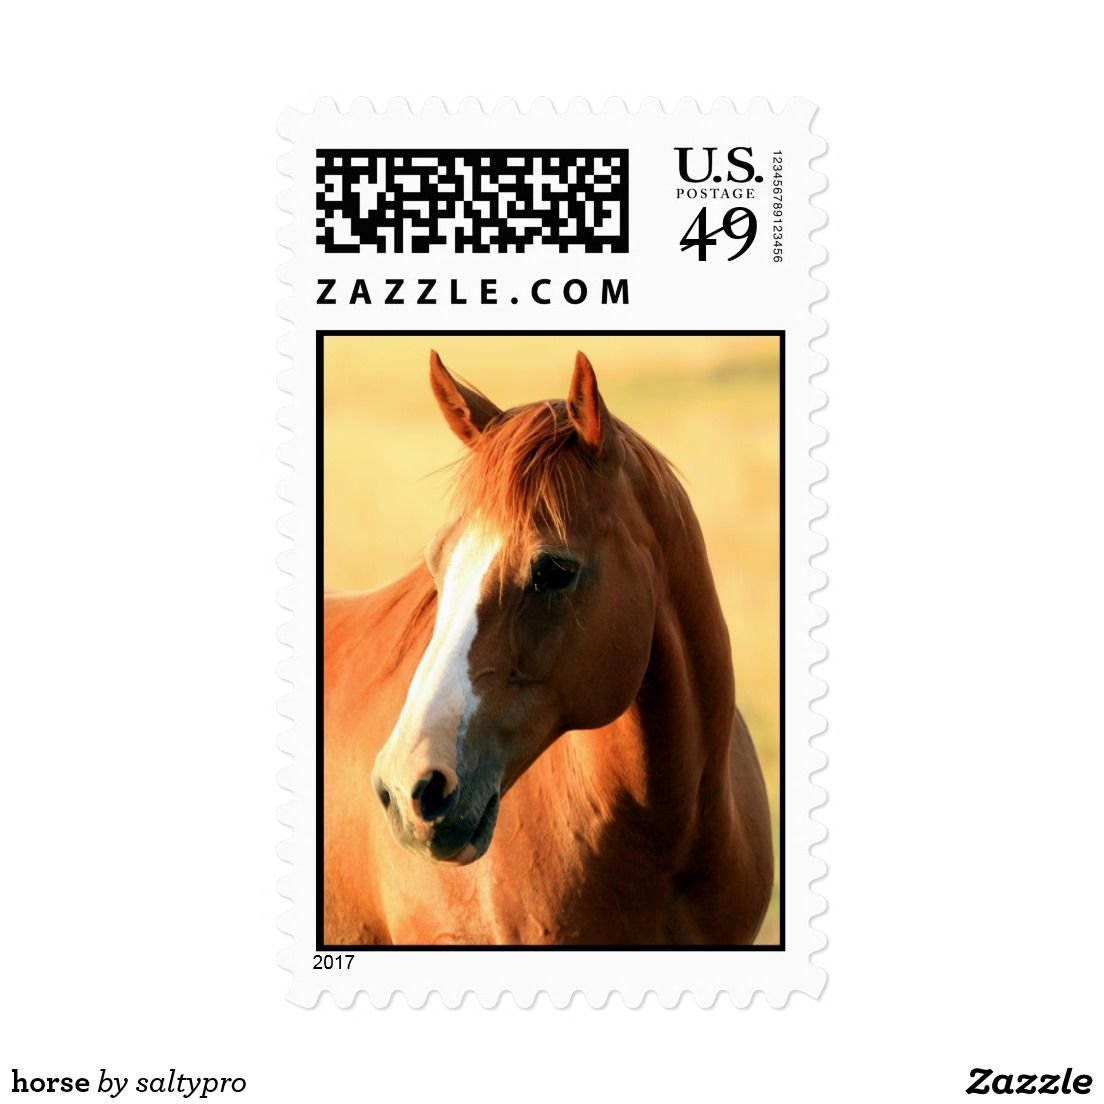 Horse Postage Zazzle Com Horses Postage Adhesive Labels